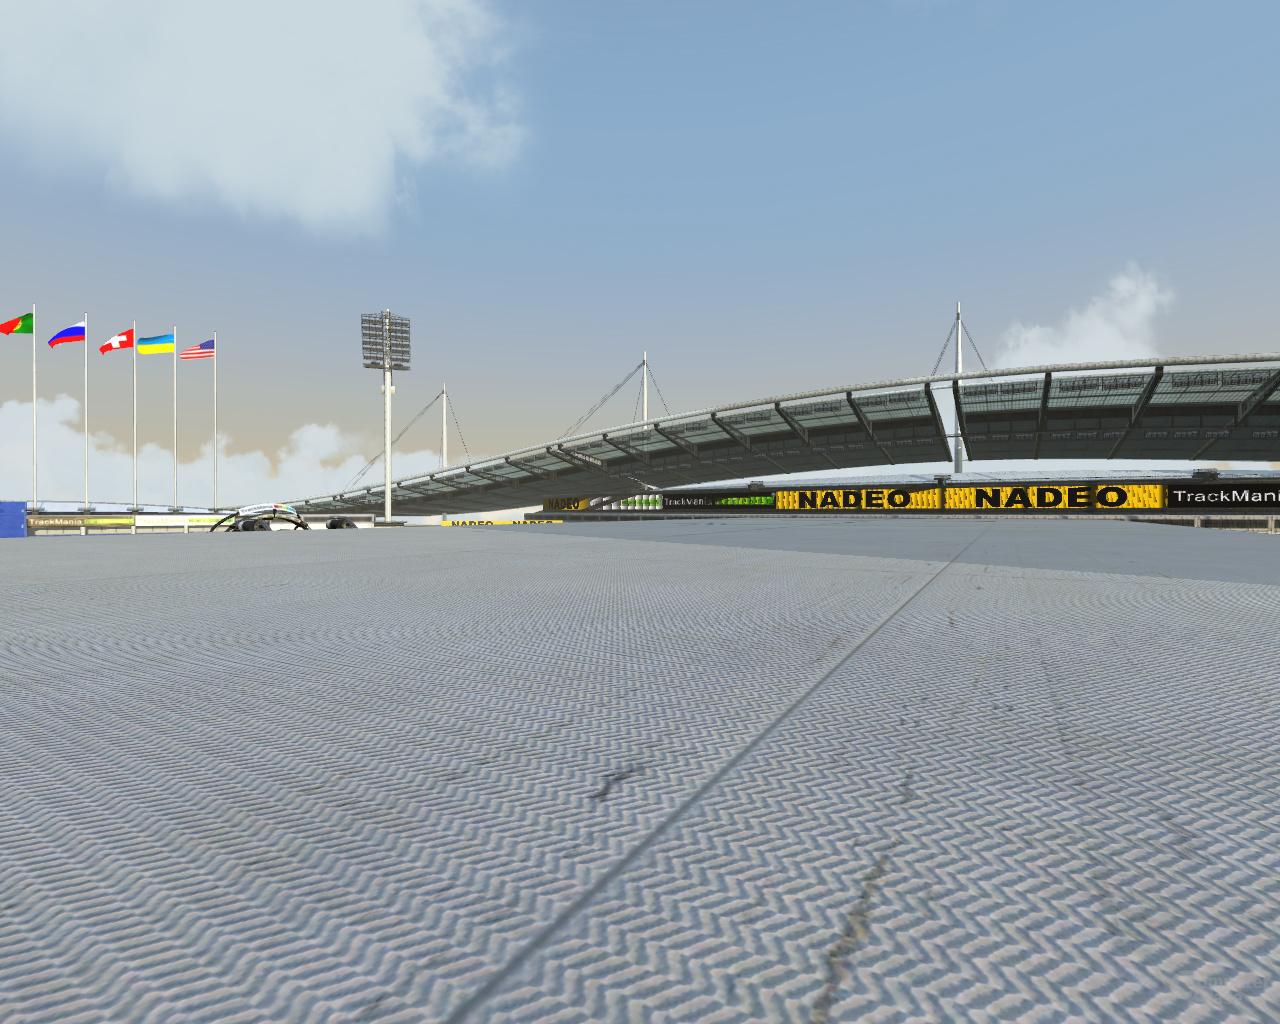 ATi RV940 Trackmania - 16xHQAF